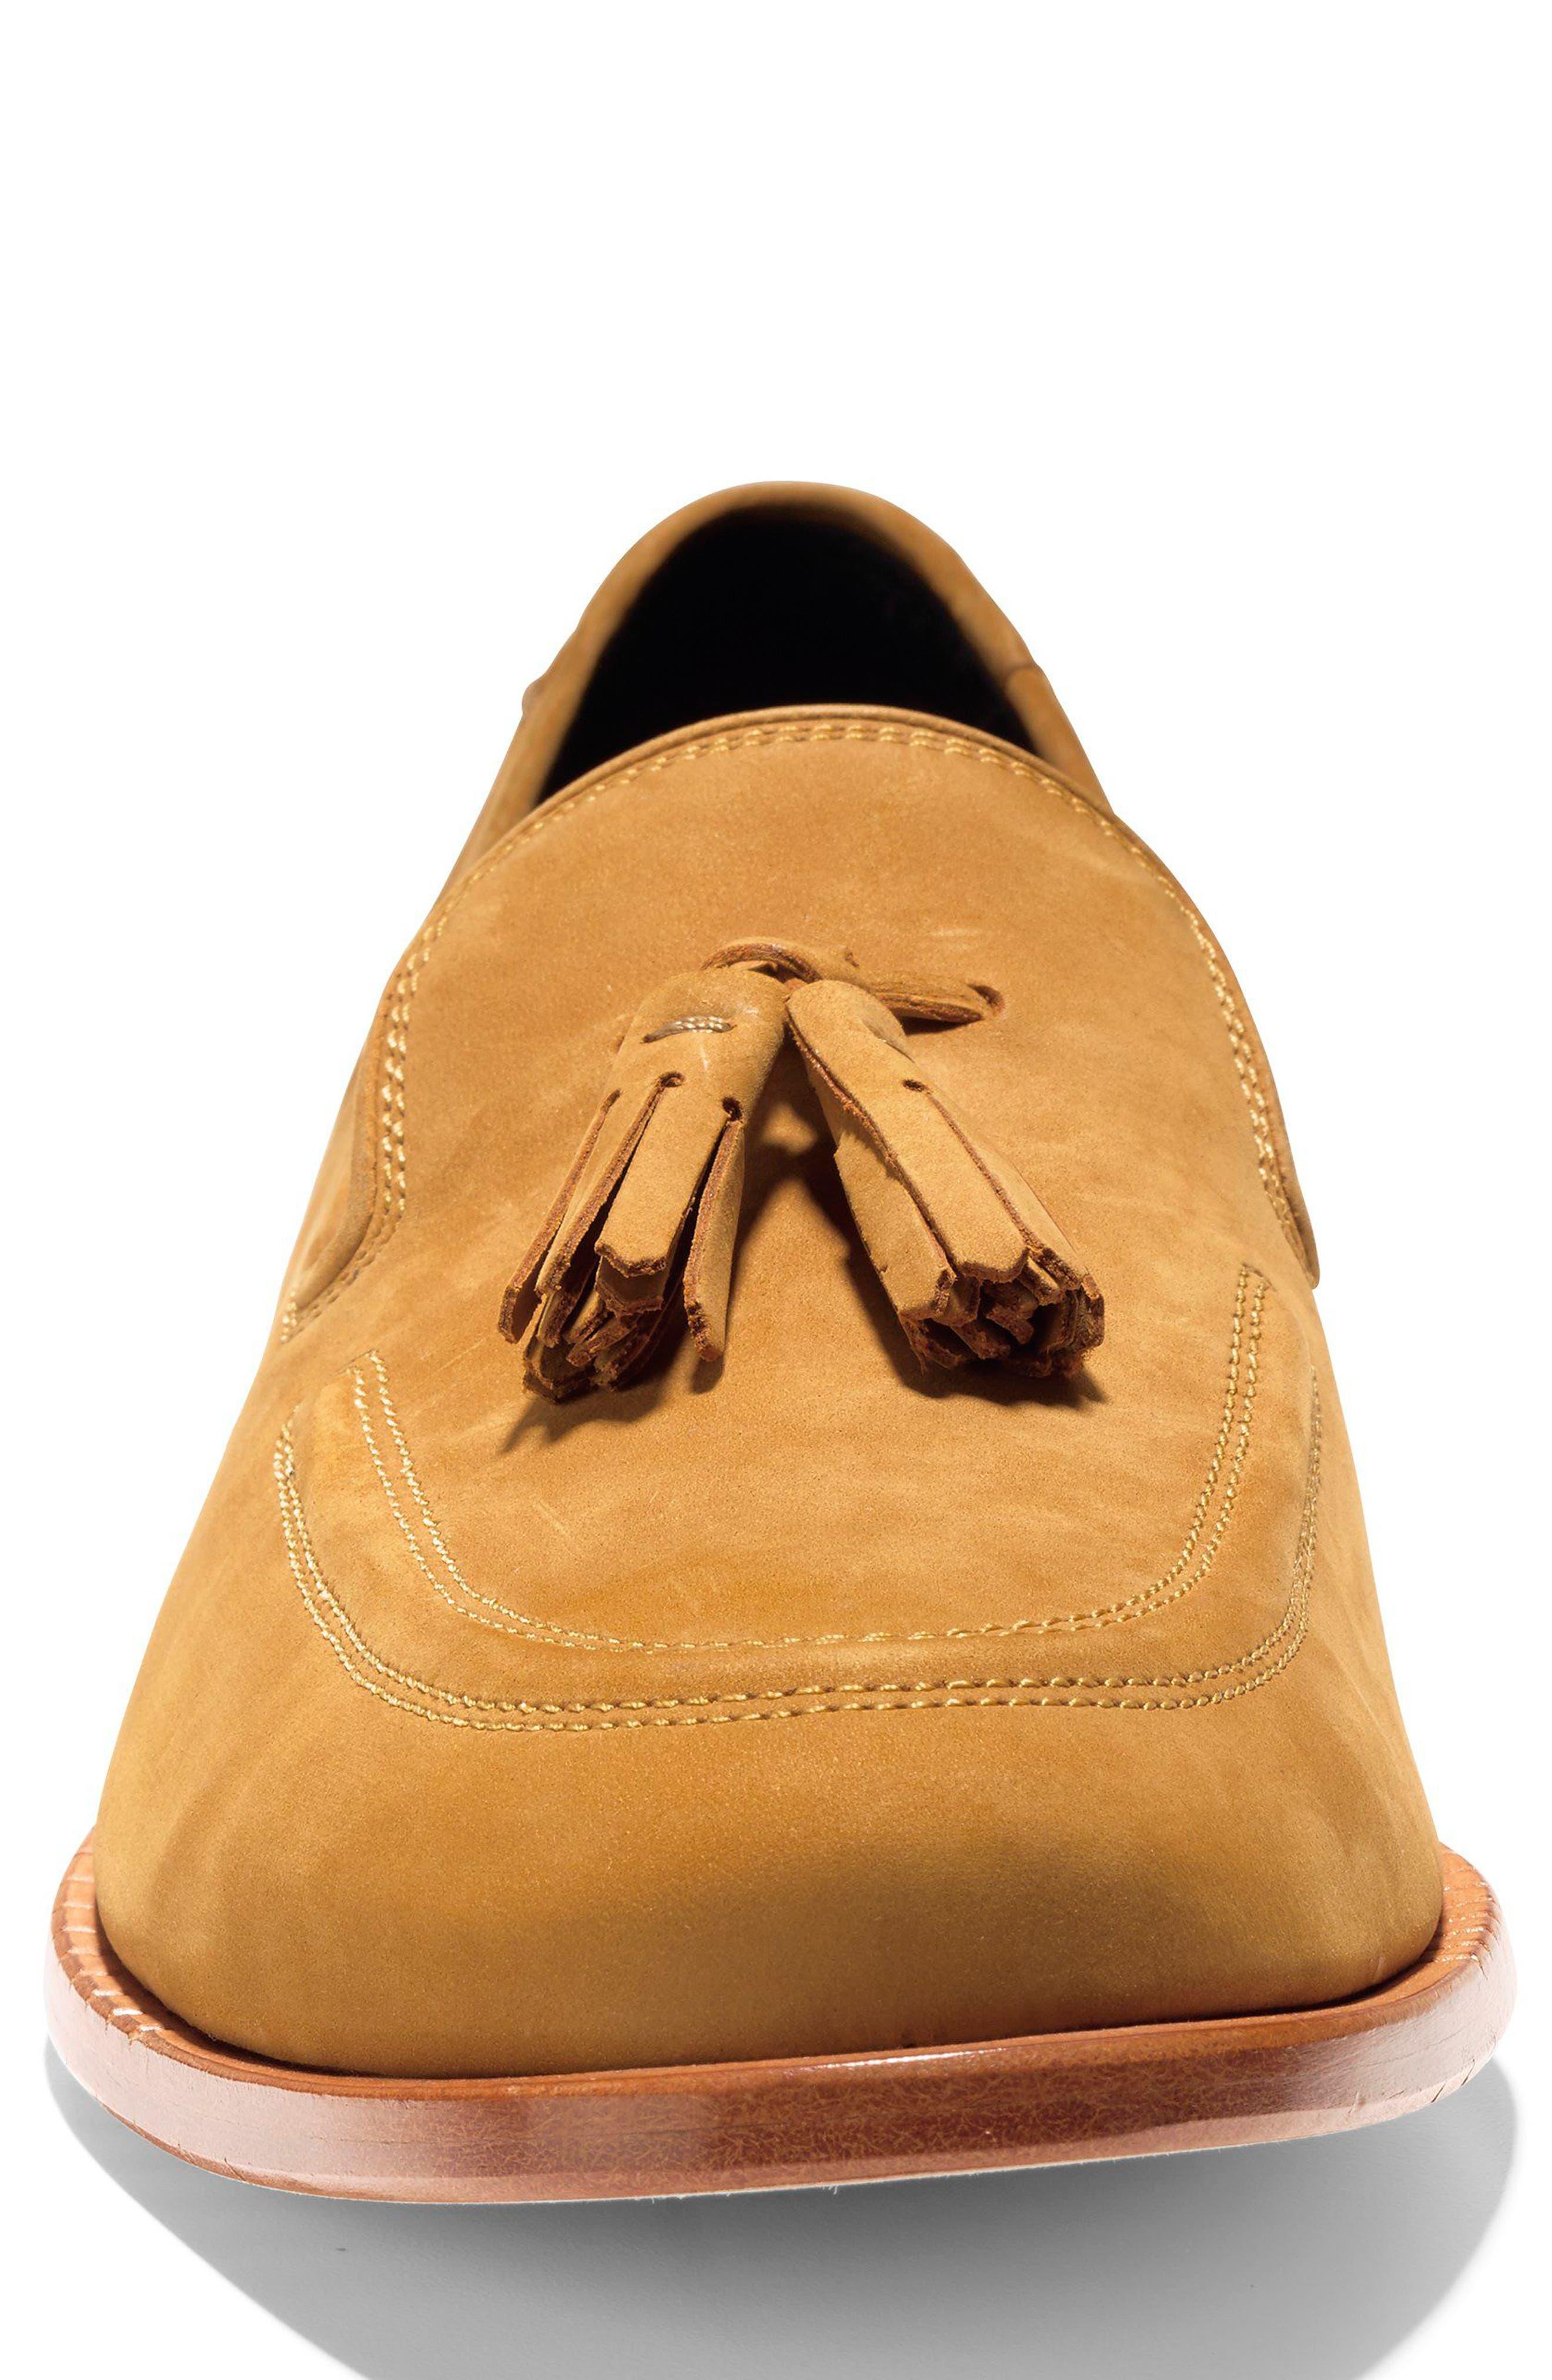 Washington Grand Tassel Loafer,                             Alternate thumbnail 4, color,                             Cathay Spice Nubuck